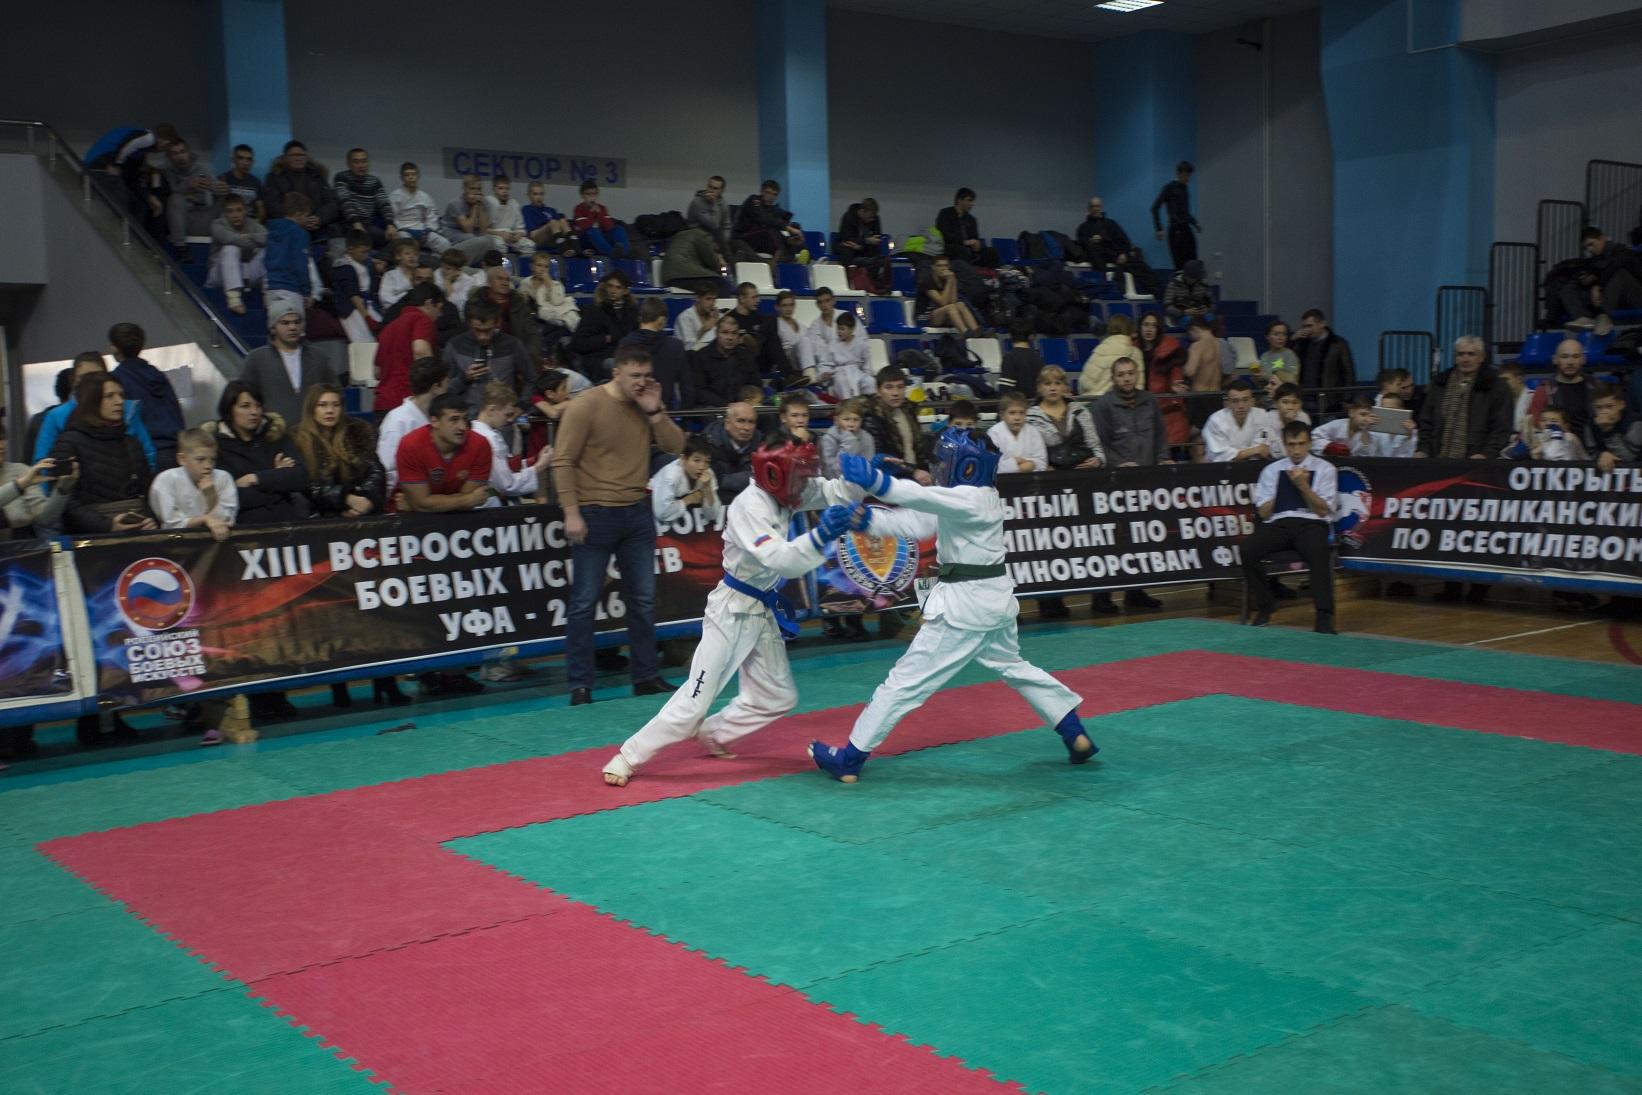 http://combatsd.ru/images/upload/IMG_8529.jpg